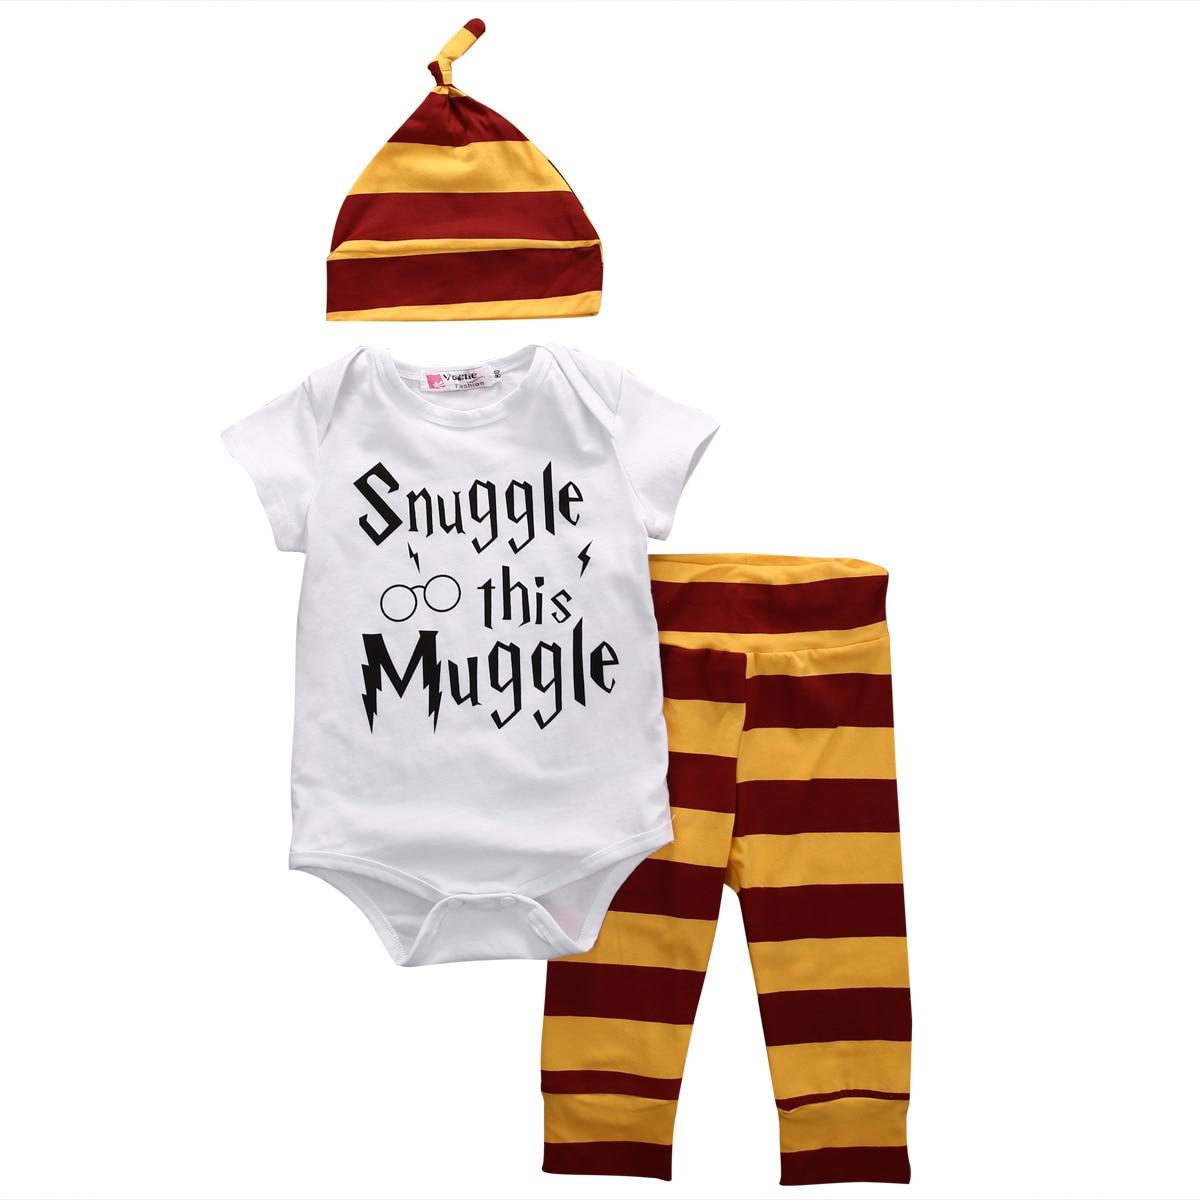 New 2016 baby boy clothing set Short sleeved printing romper +pants+hat fashion baby boys girls clothes newborn 3pcs suit